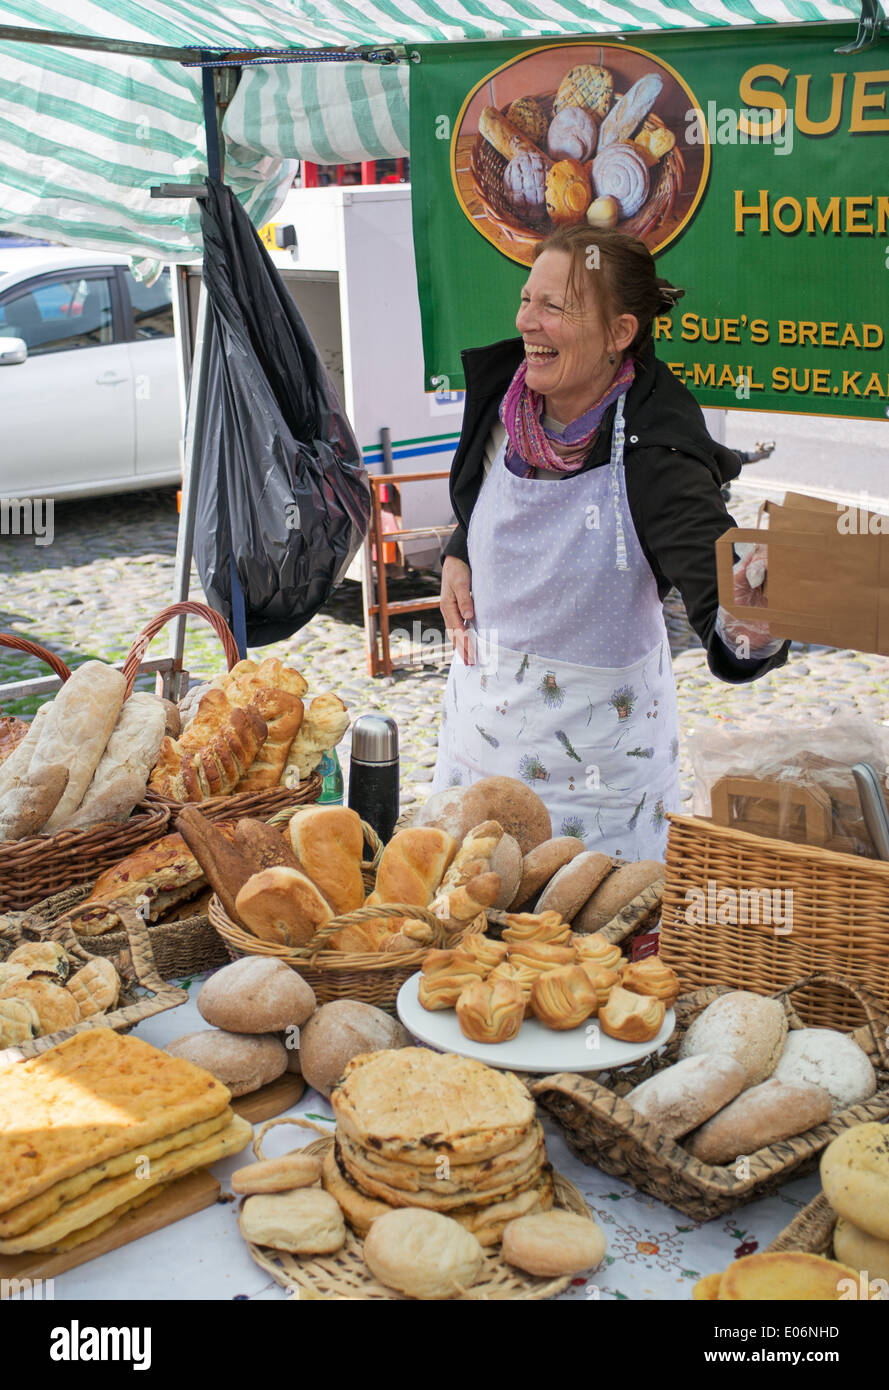 Sue's Bread, smiling lady artisan baker Barnard Castle farmers market north east England UK - Stock Image